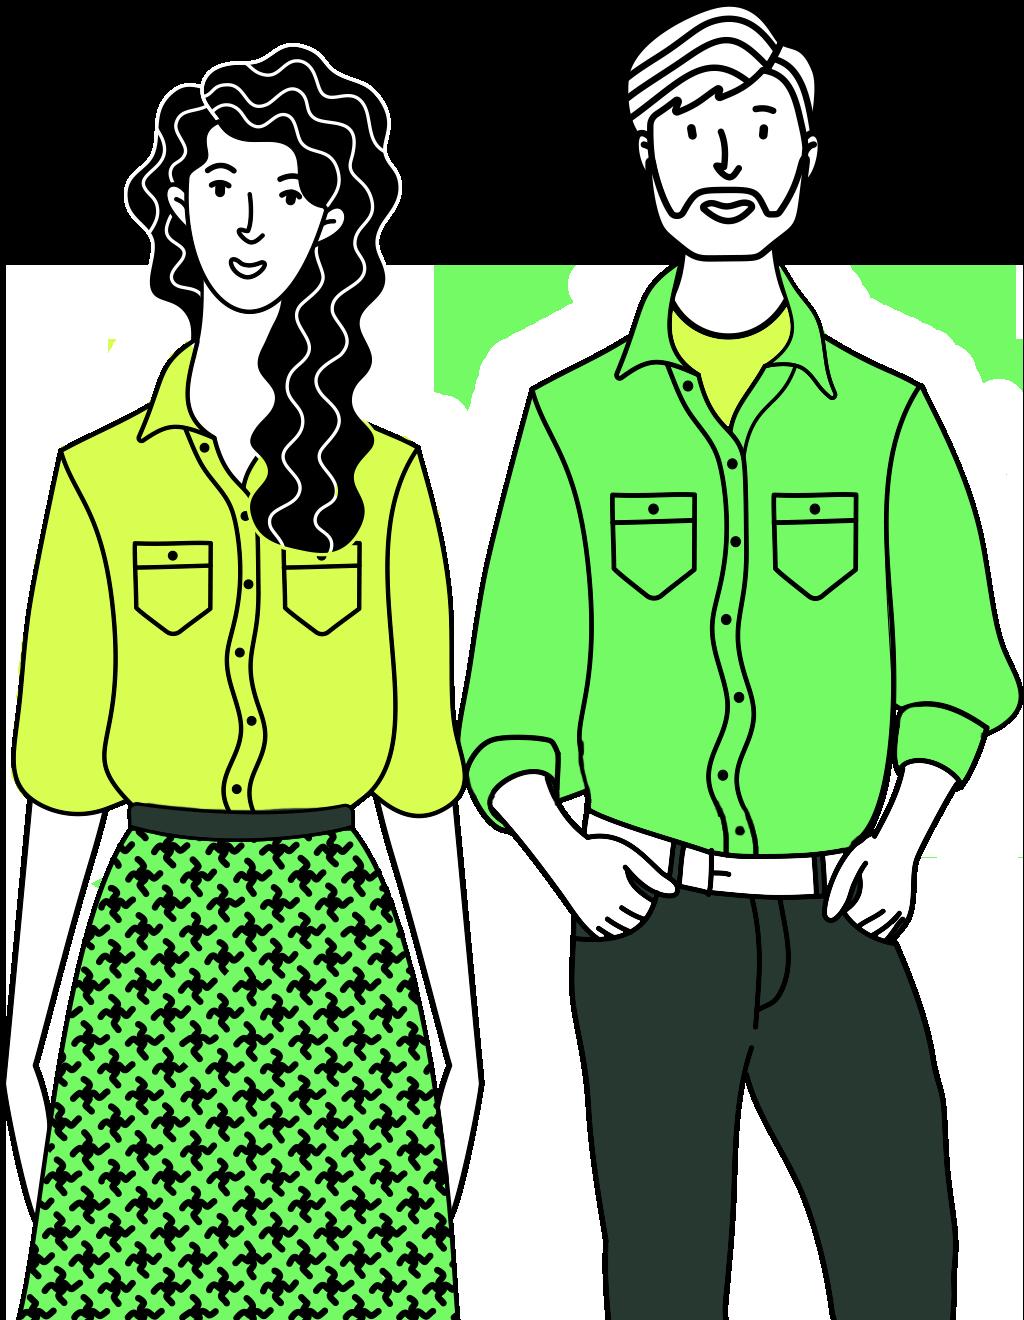 male female couple image